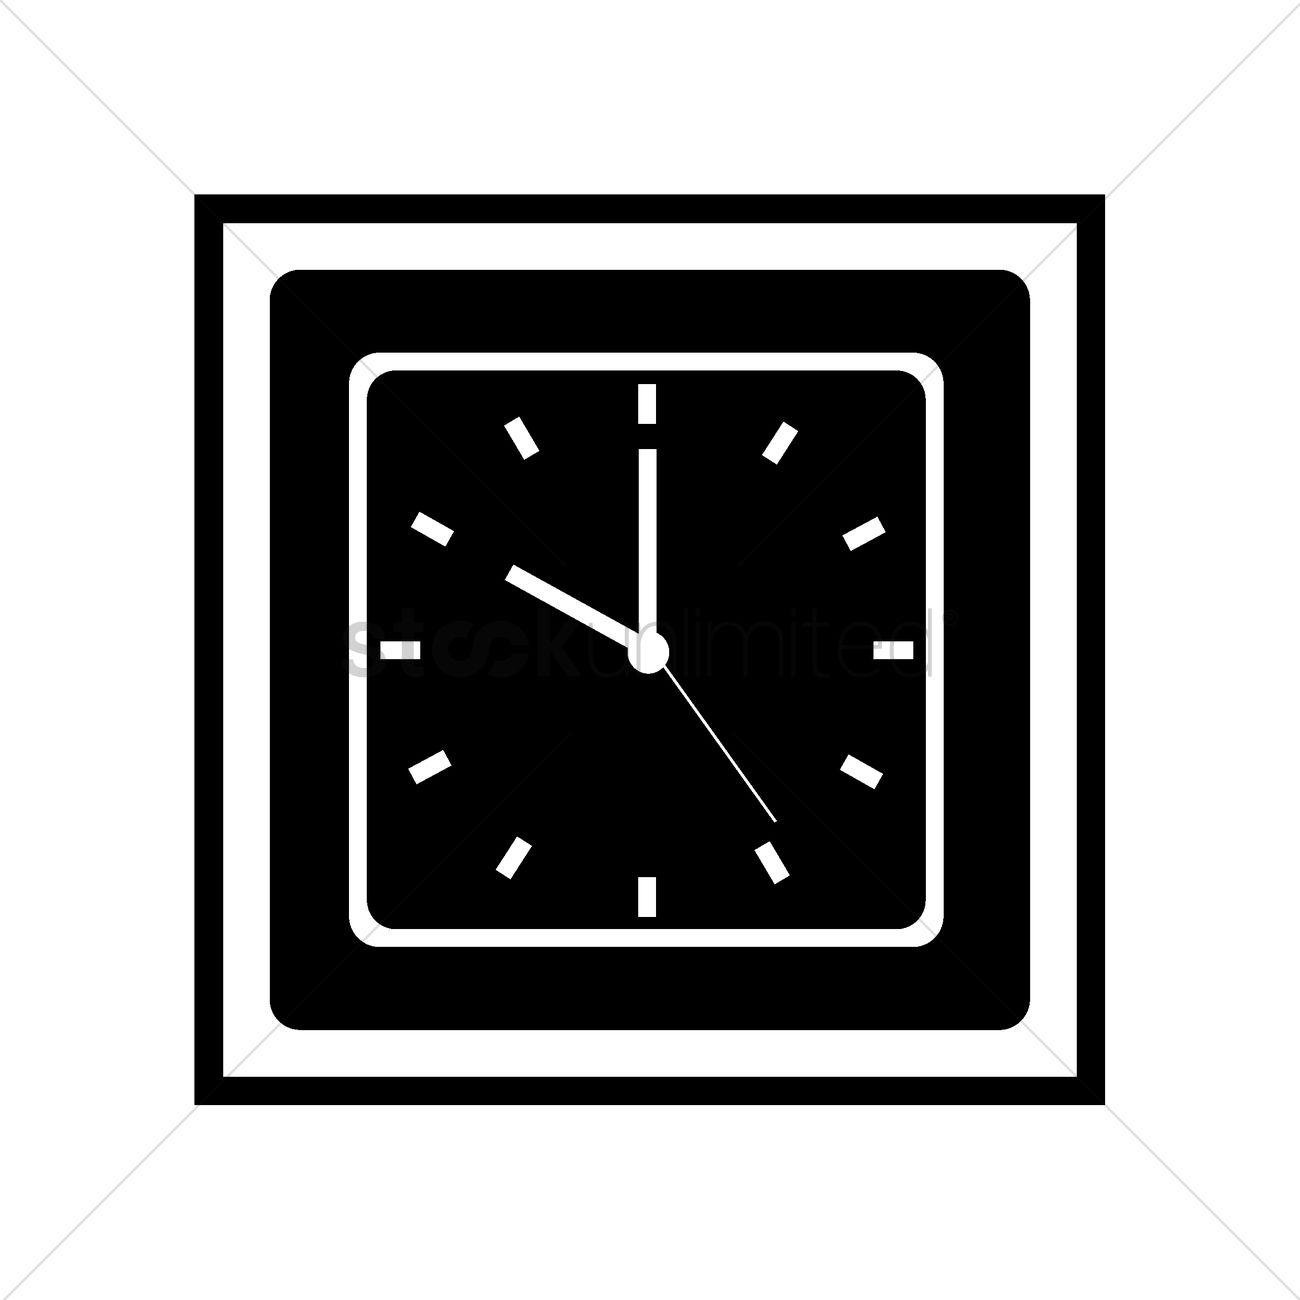 Clock icon Vector Image - 2001961 | StockUnlimited